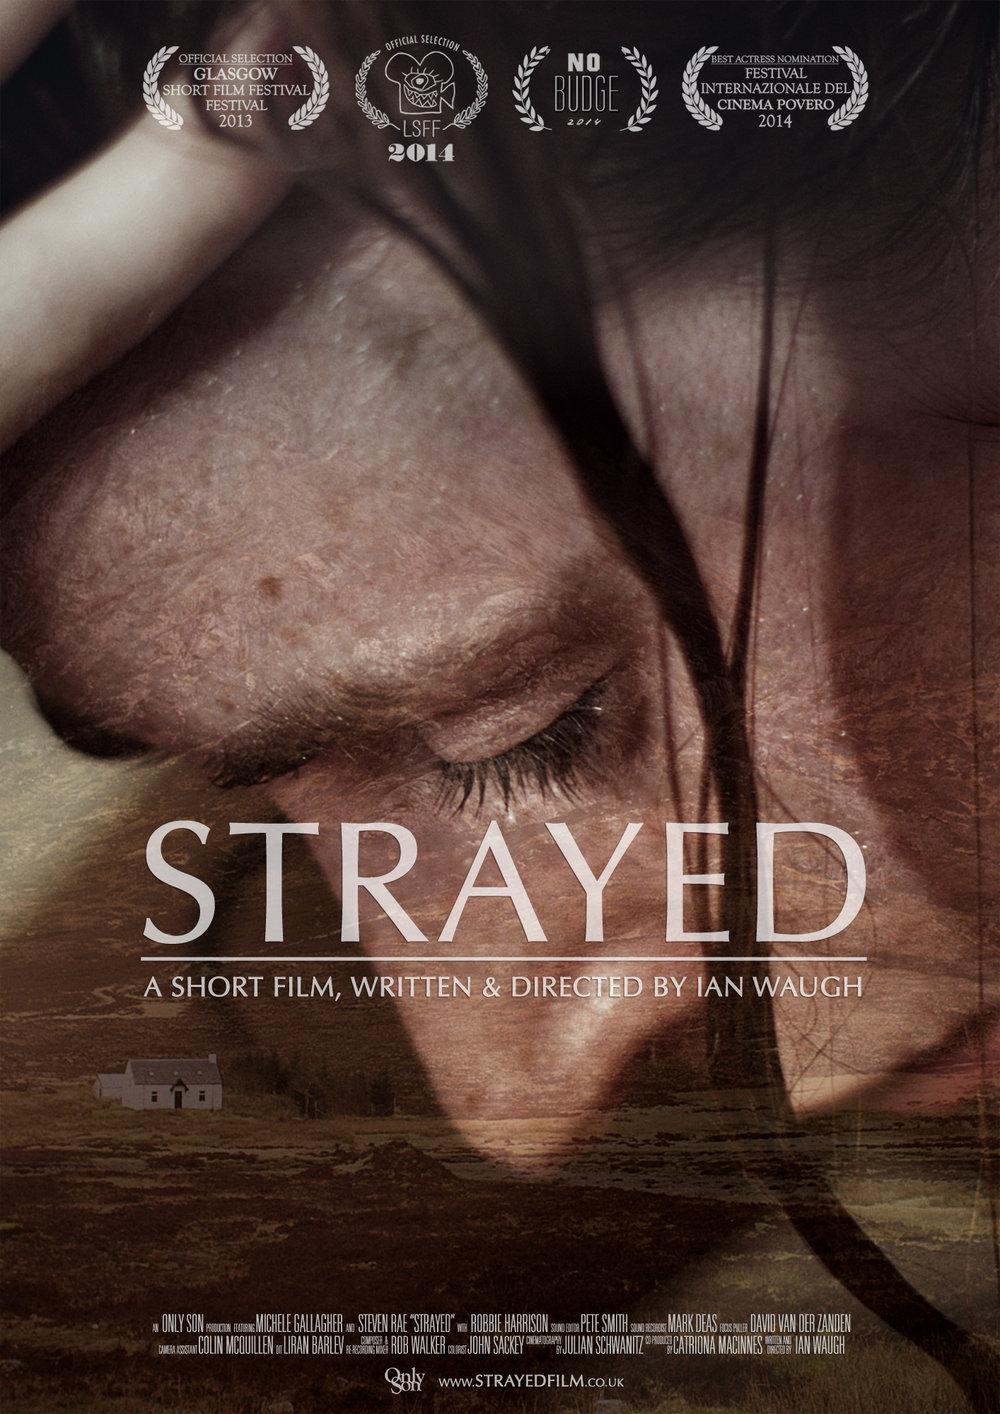 STRAYED_IMDbPoster_27Nov2016_Poster_Merge_FESTIVAL_LAURELS_Portrait_WEB.jpg